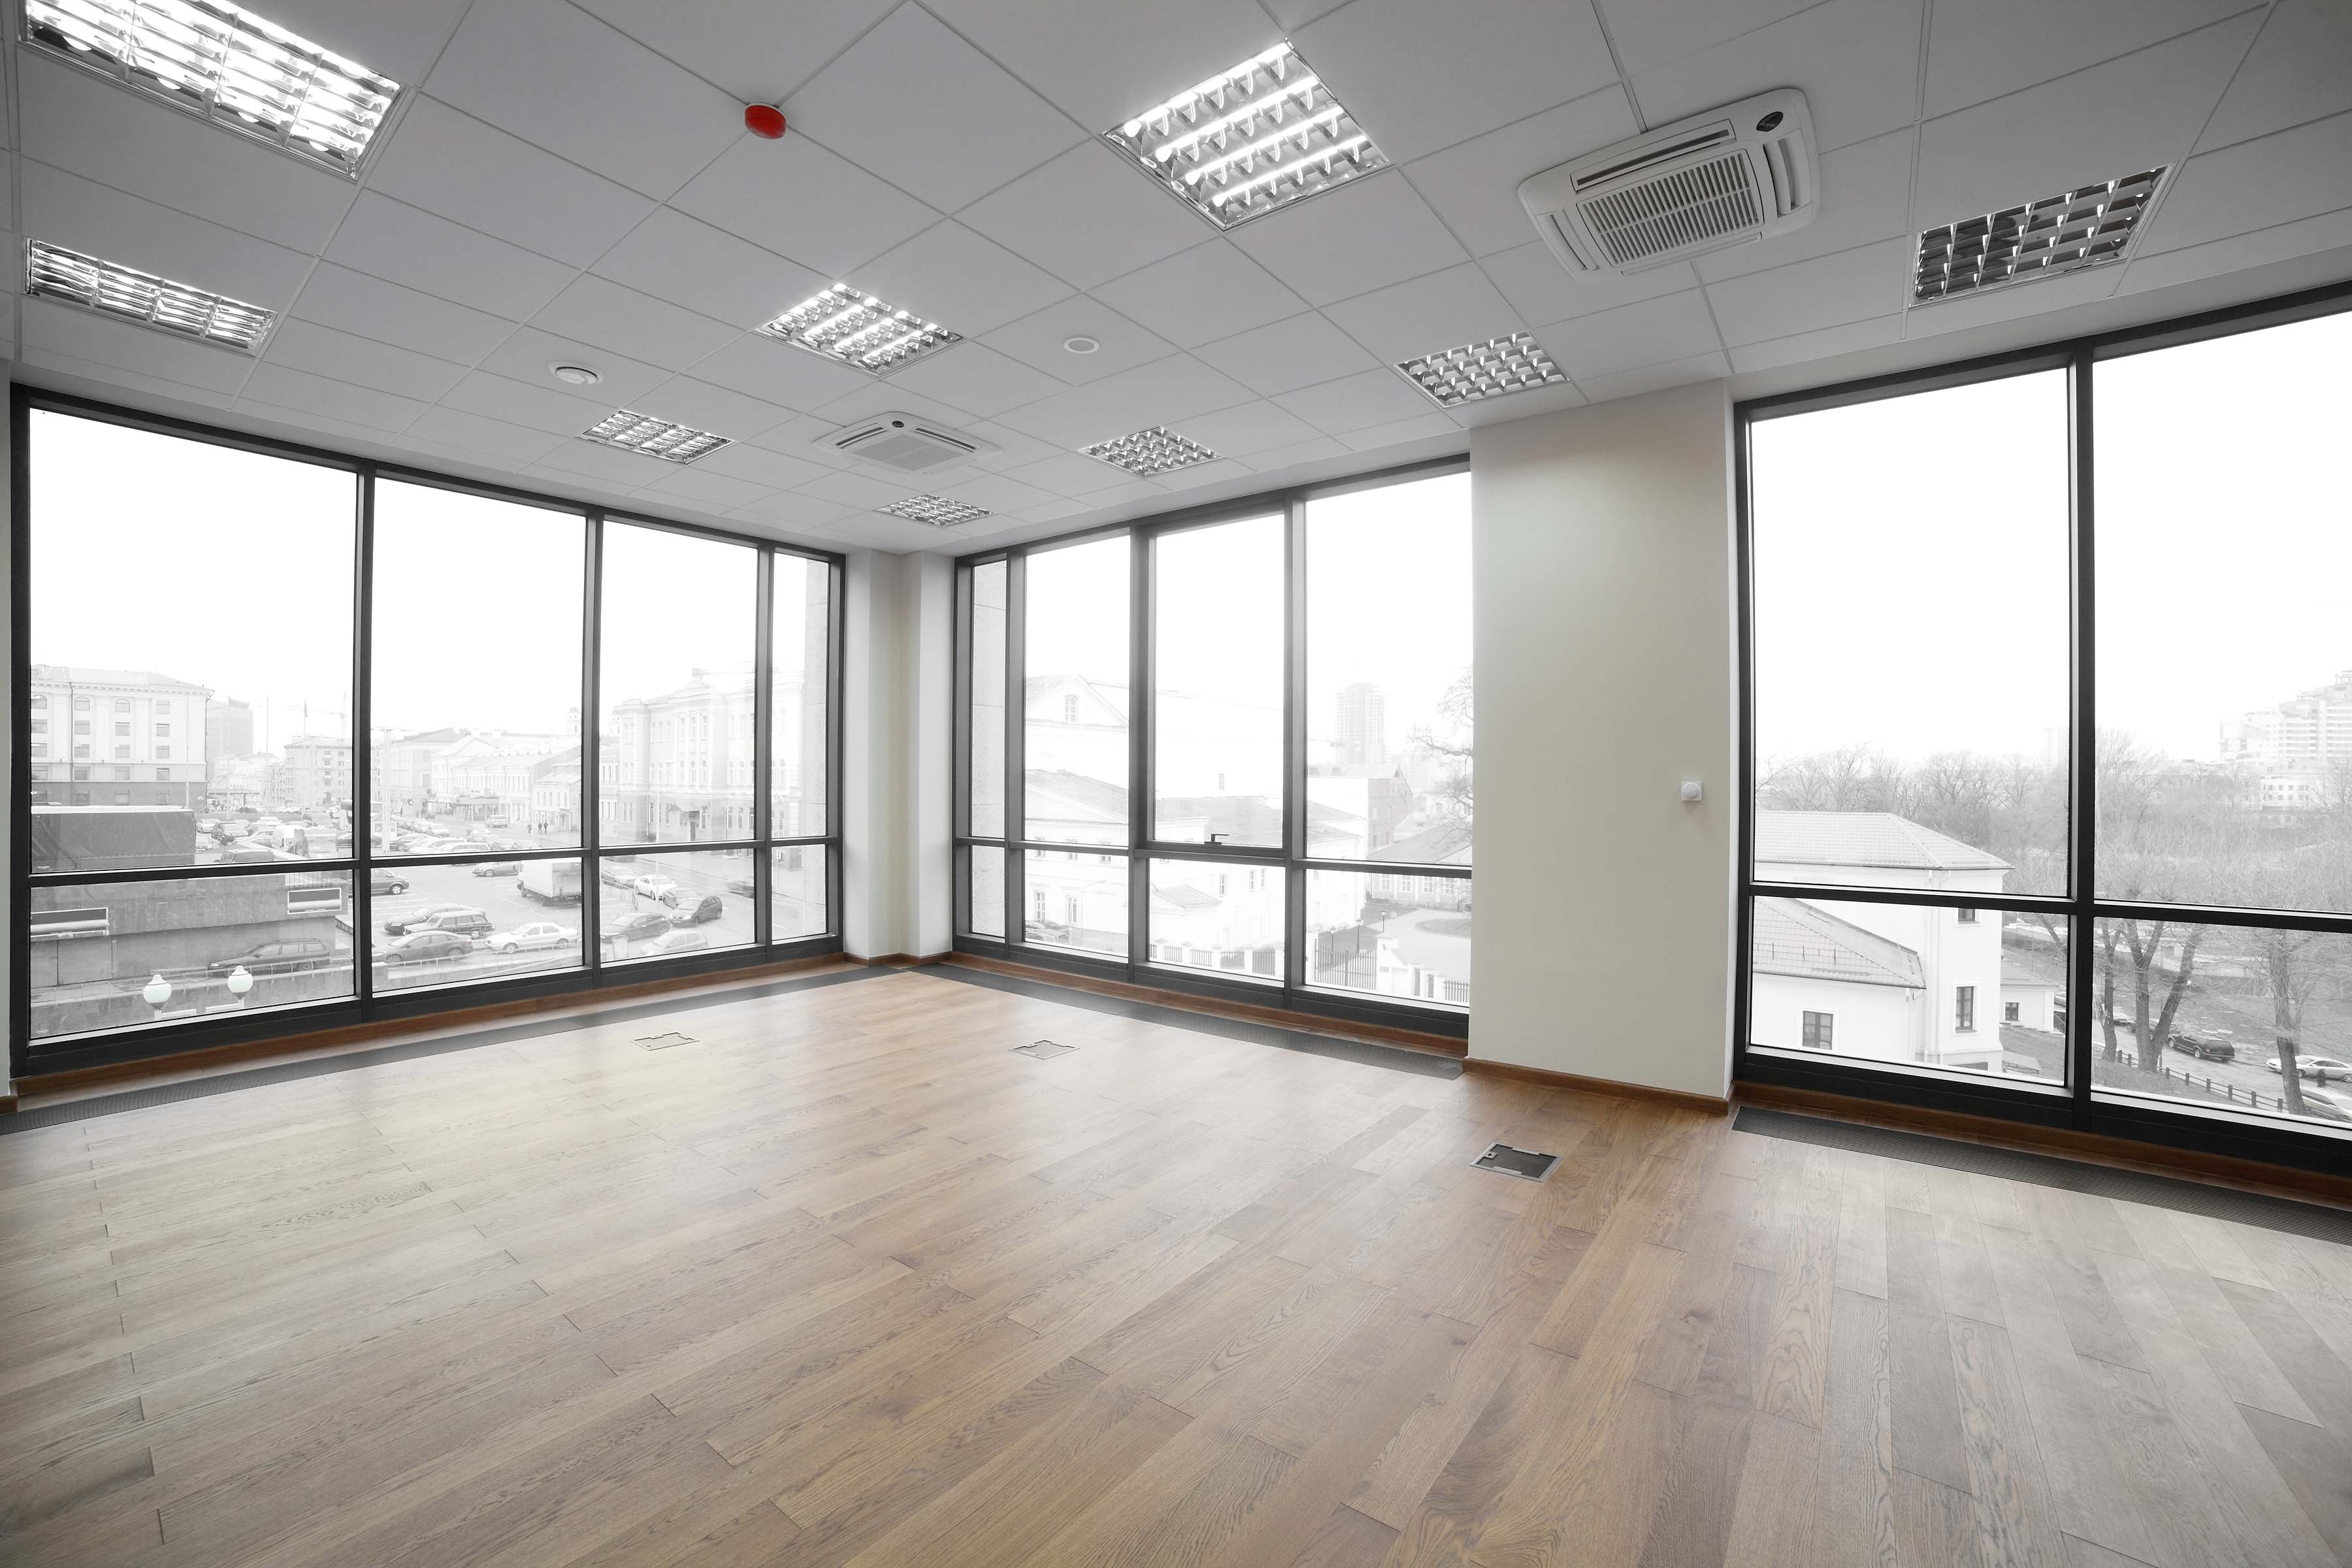 Office internal 2